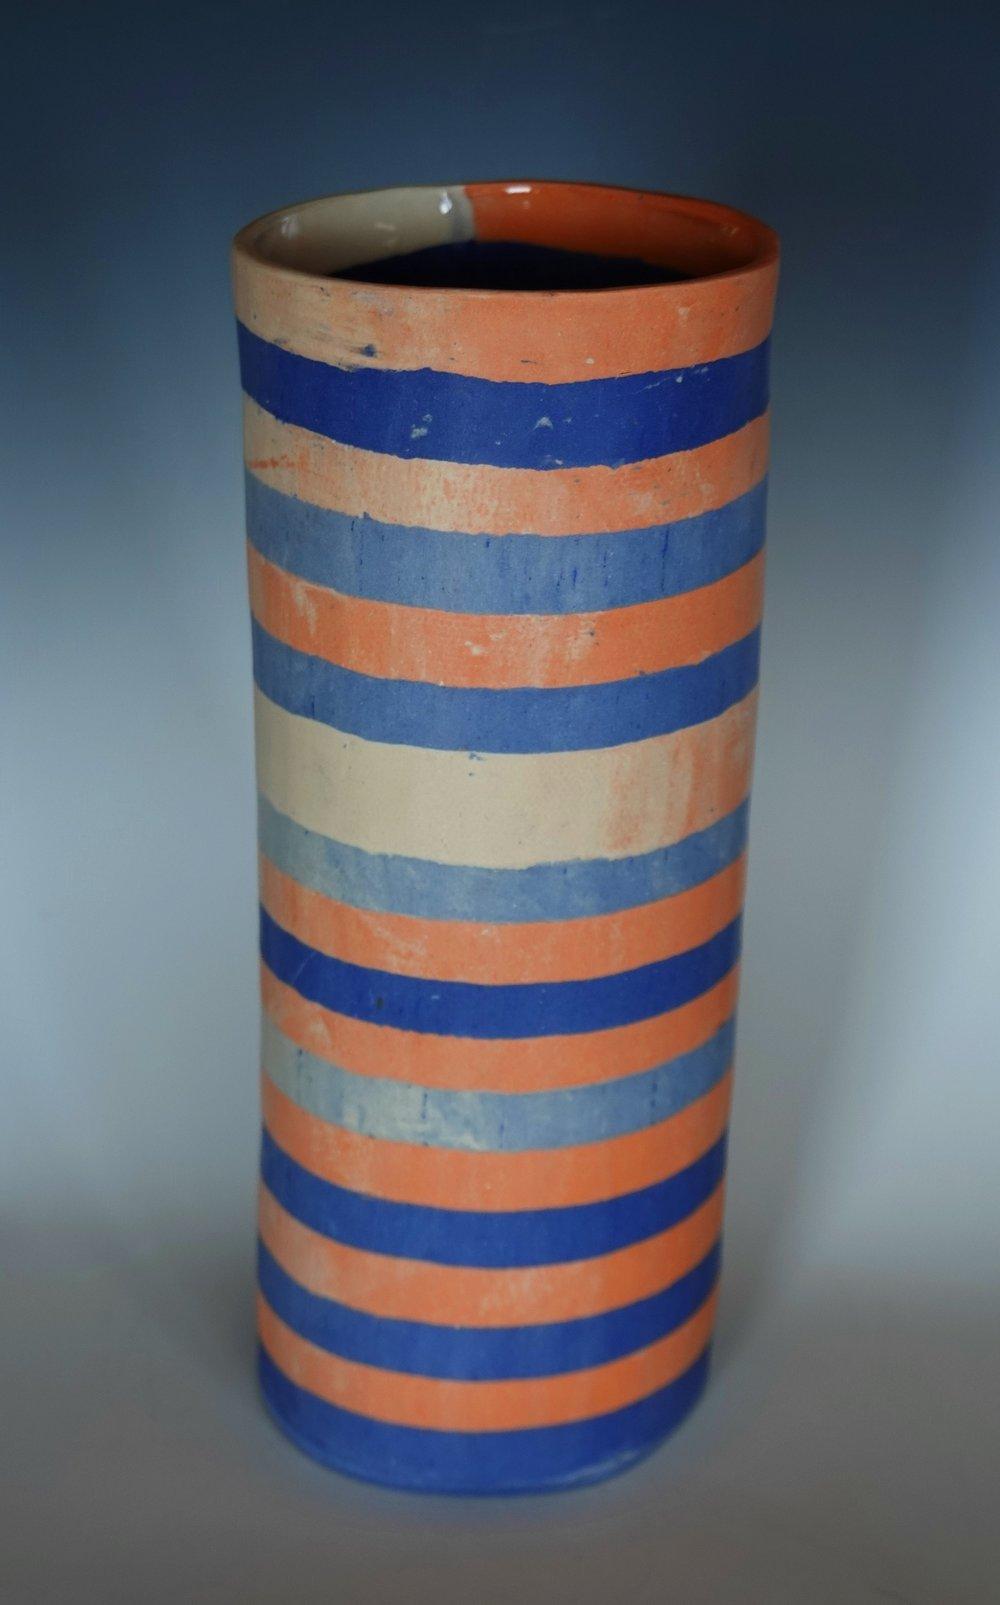 rosenberg.jessica.2019.Cylinder in blues tangerine and cream stripes.JPG